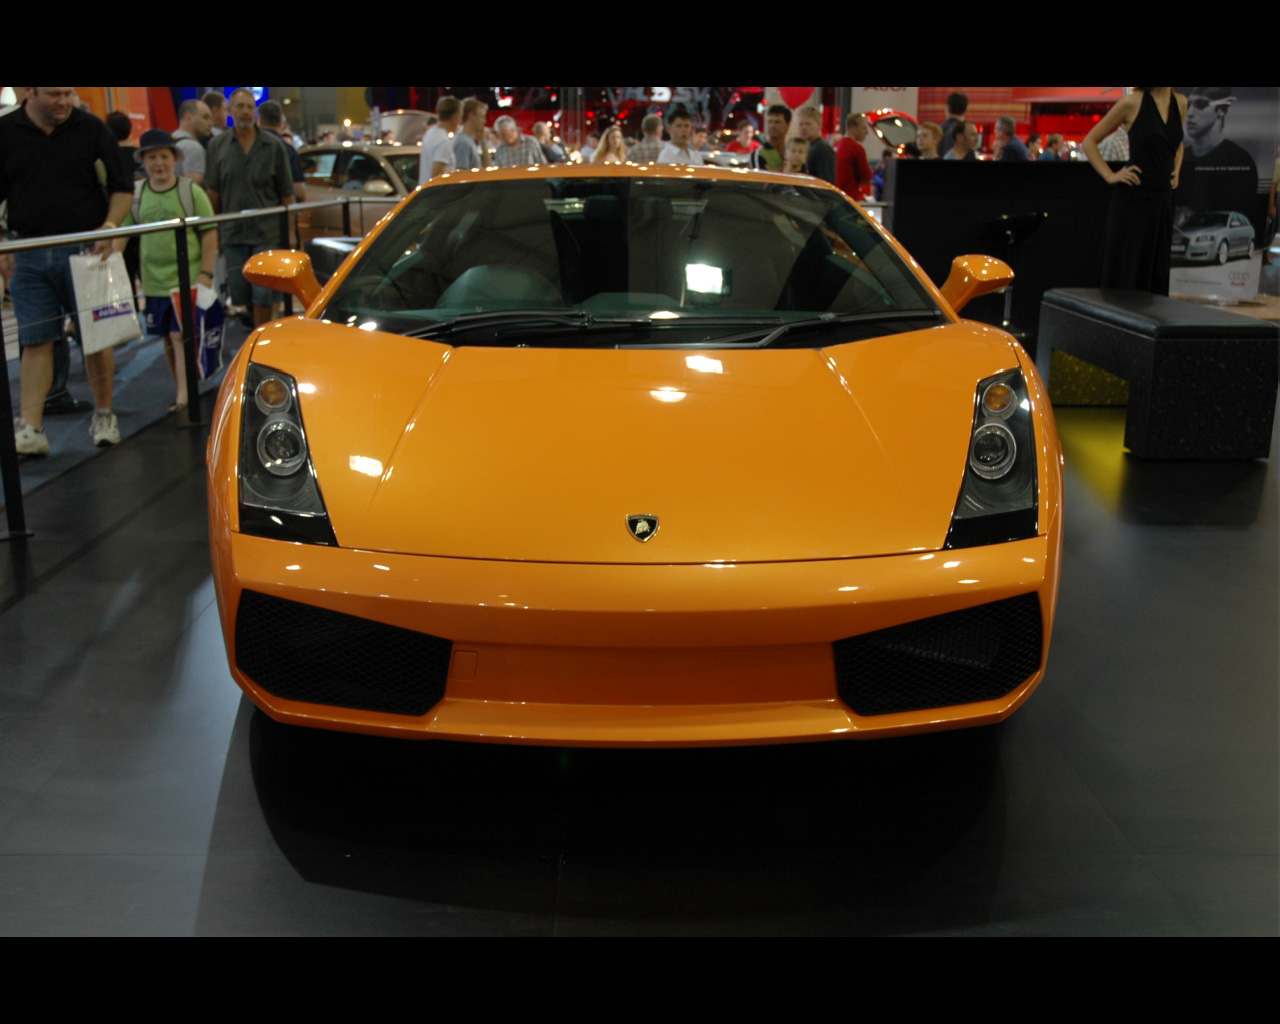 Lamborghini Motorshow 05: Motoshow 9. Motoshow 9 - Motorshow 05